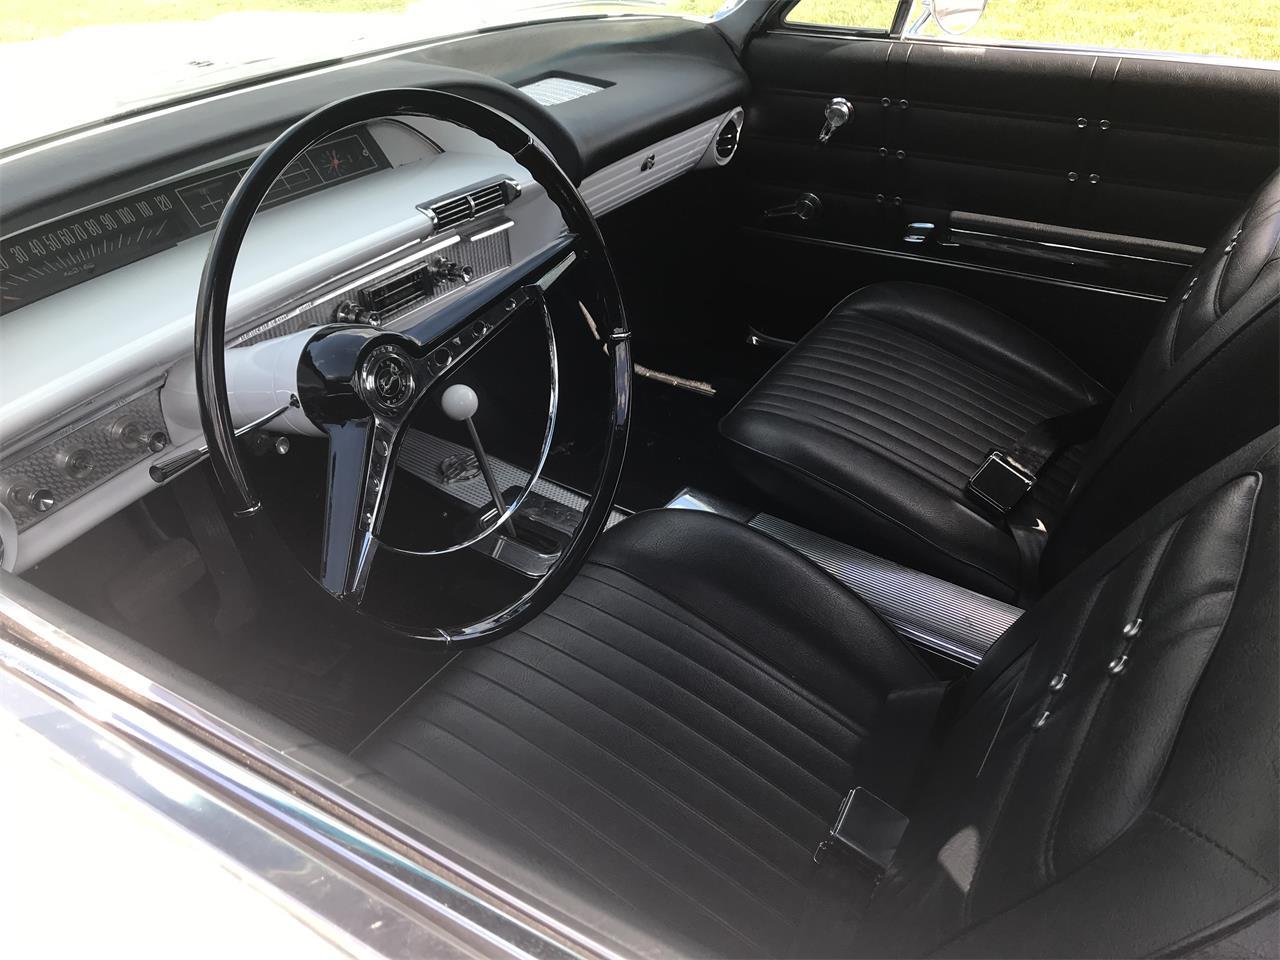 1963 Chevrolet Impala SS (CC-1358931) for sale in WICHITA, Kansas